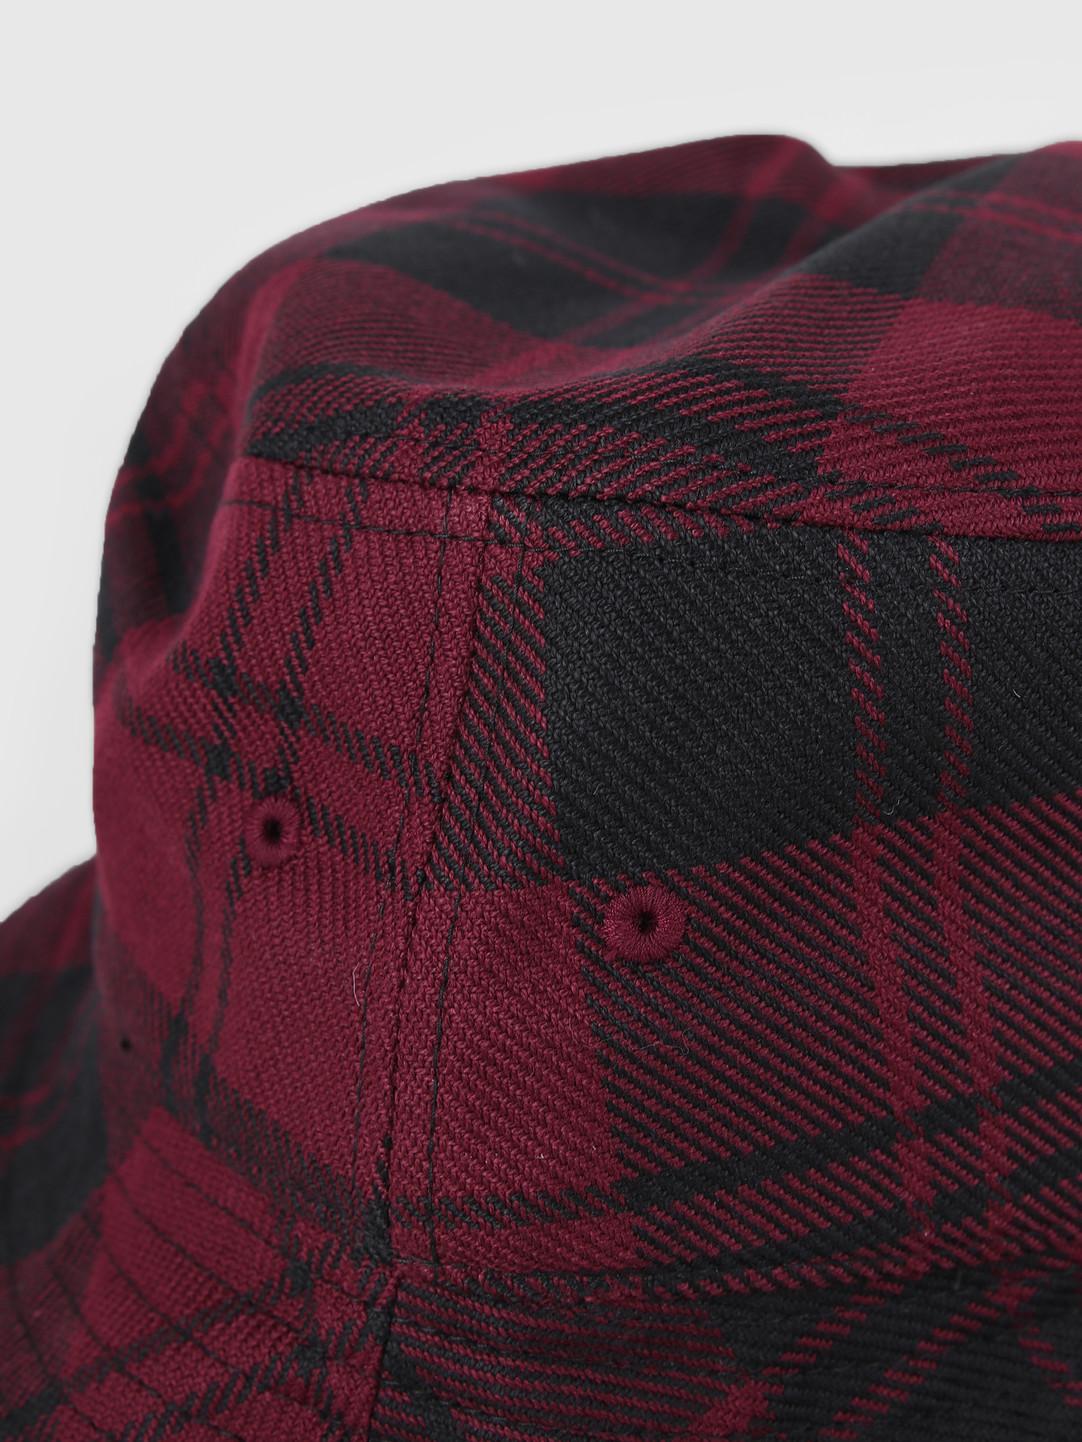 Carhartt WIP Carhartt WIP Pulford Bucket Hat Pulford Check Merlot I026887